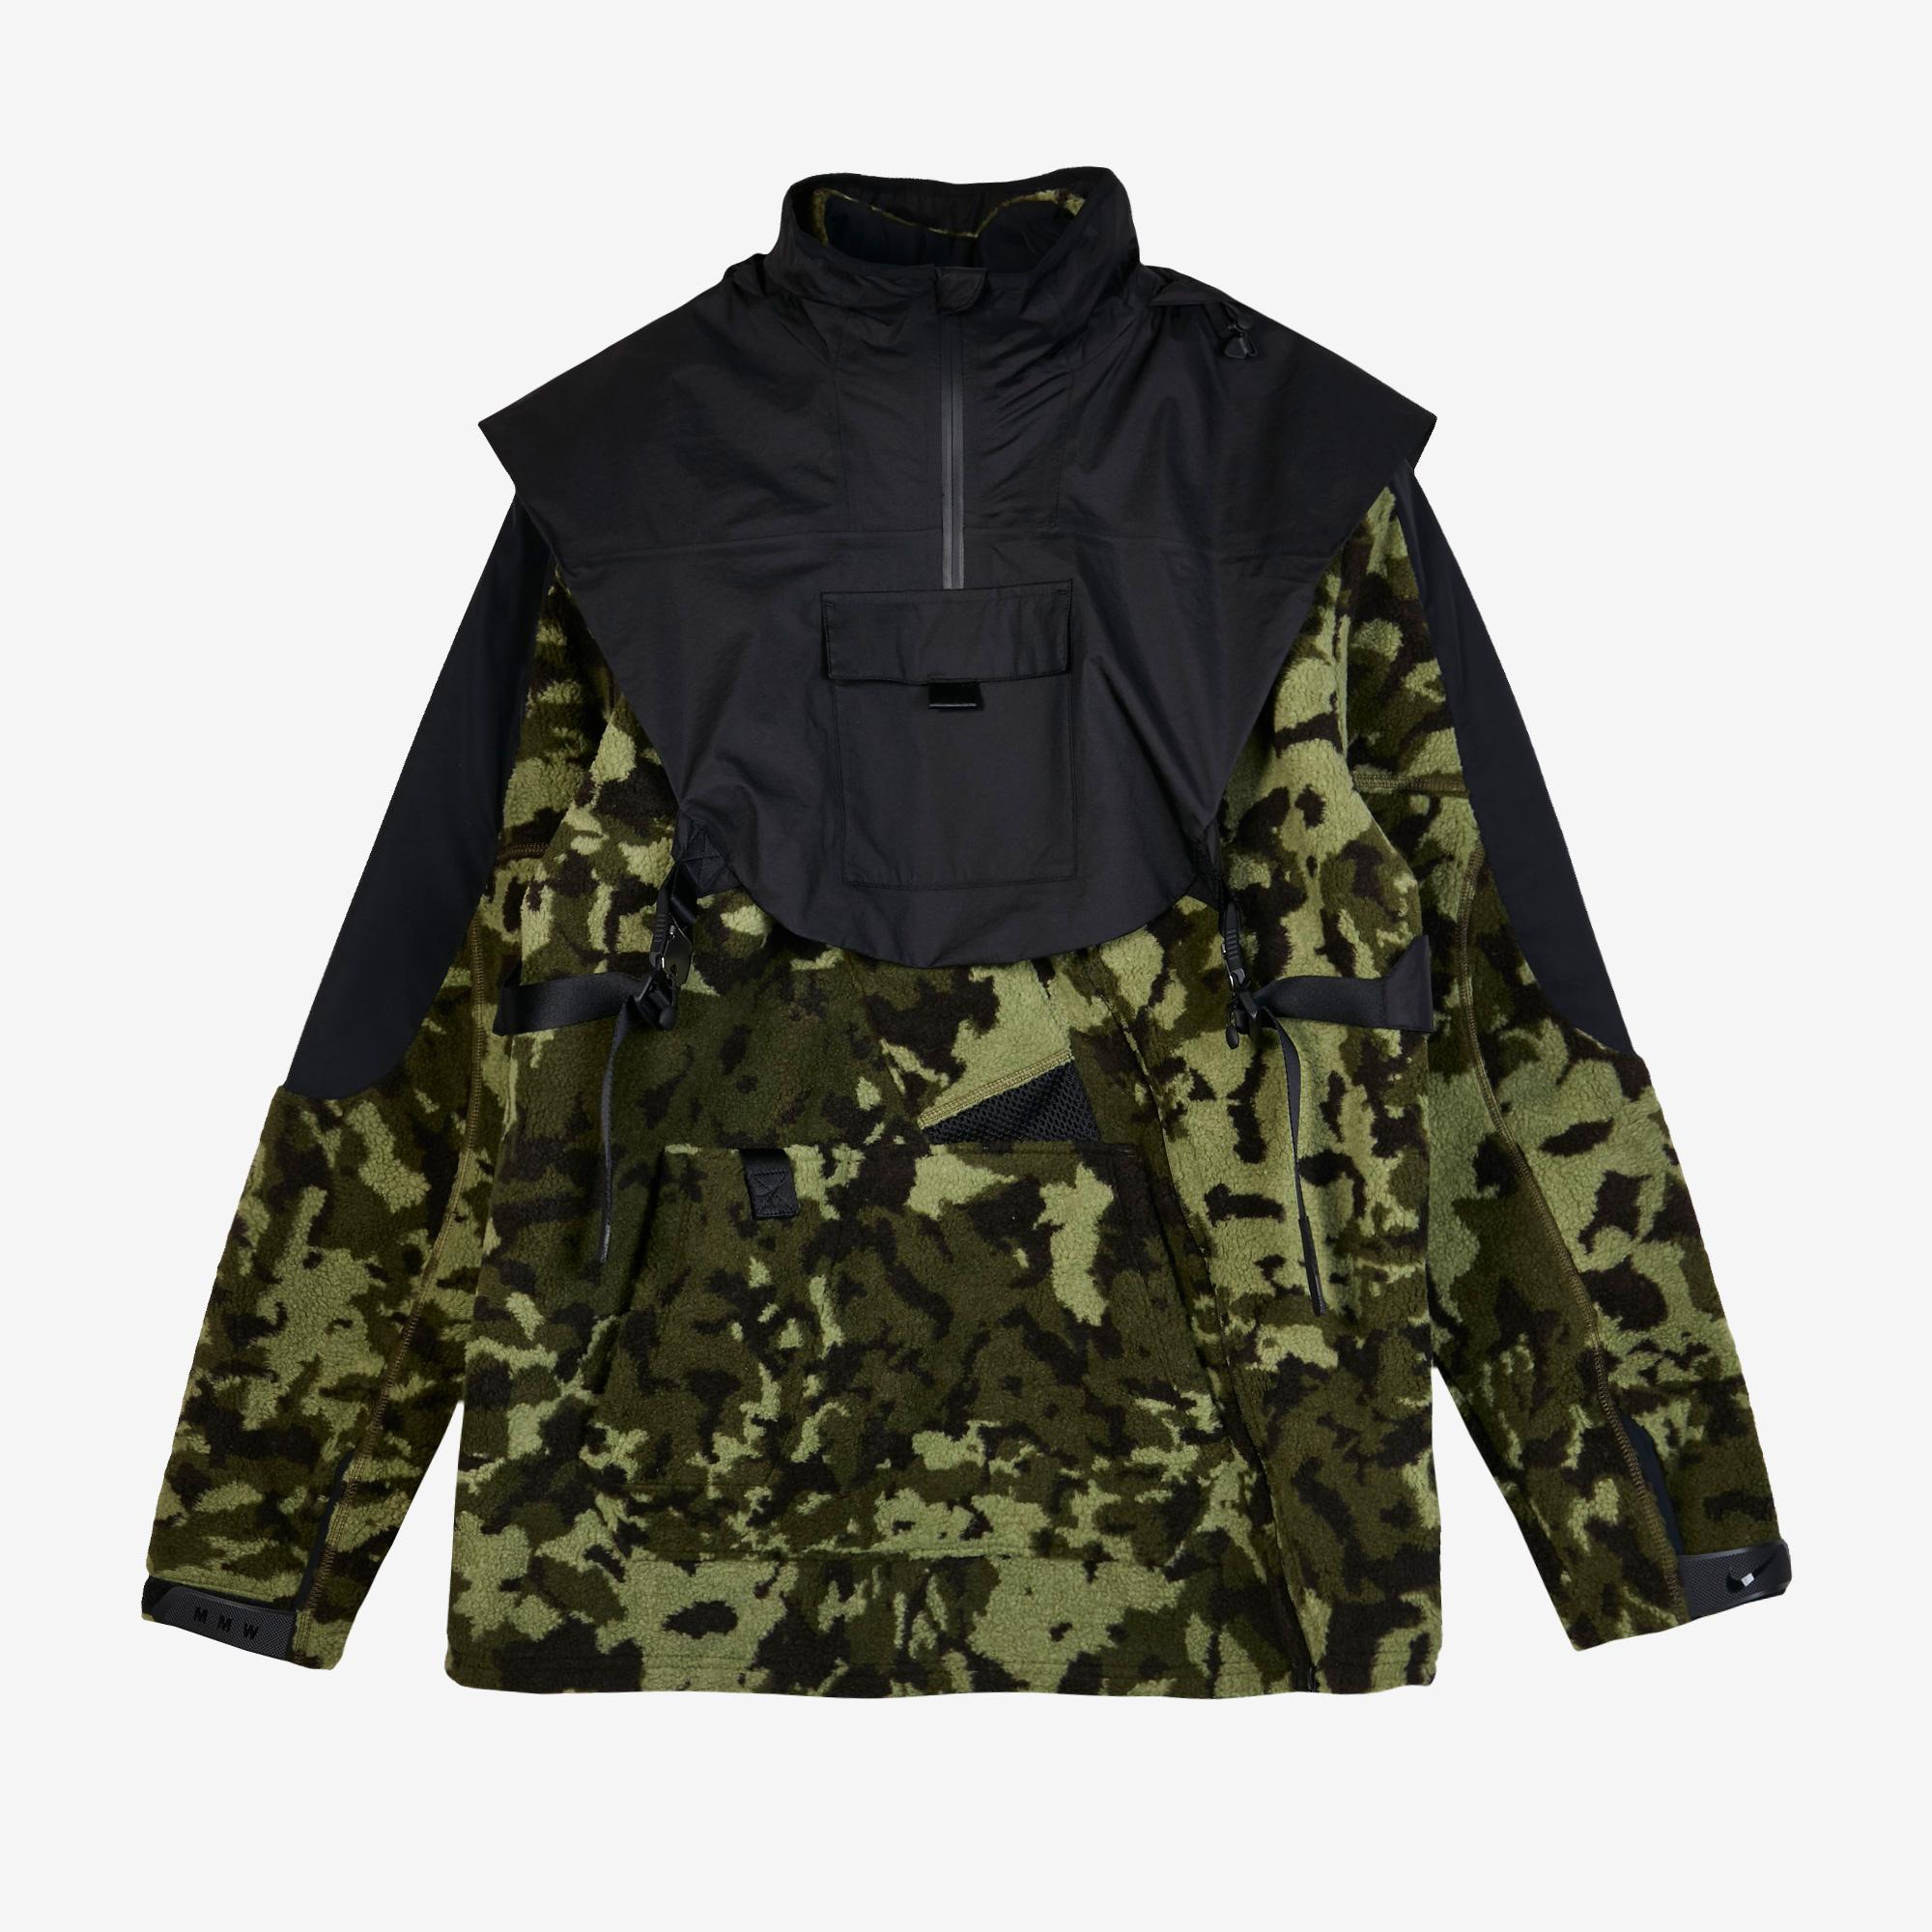 Nike Hooded Jacket x MMW - Ar5611-010 - Sneakersnstuff  d1ef86cdc